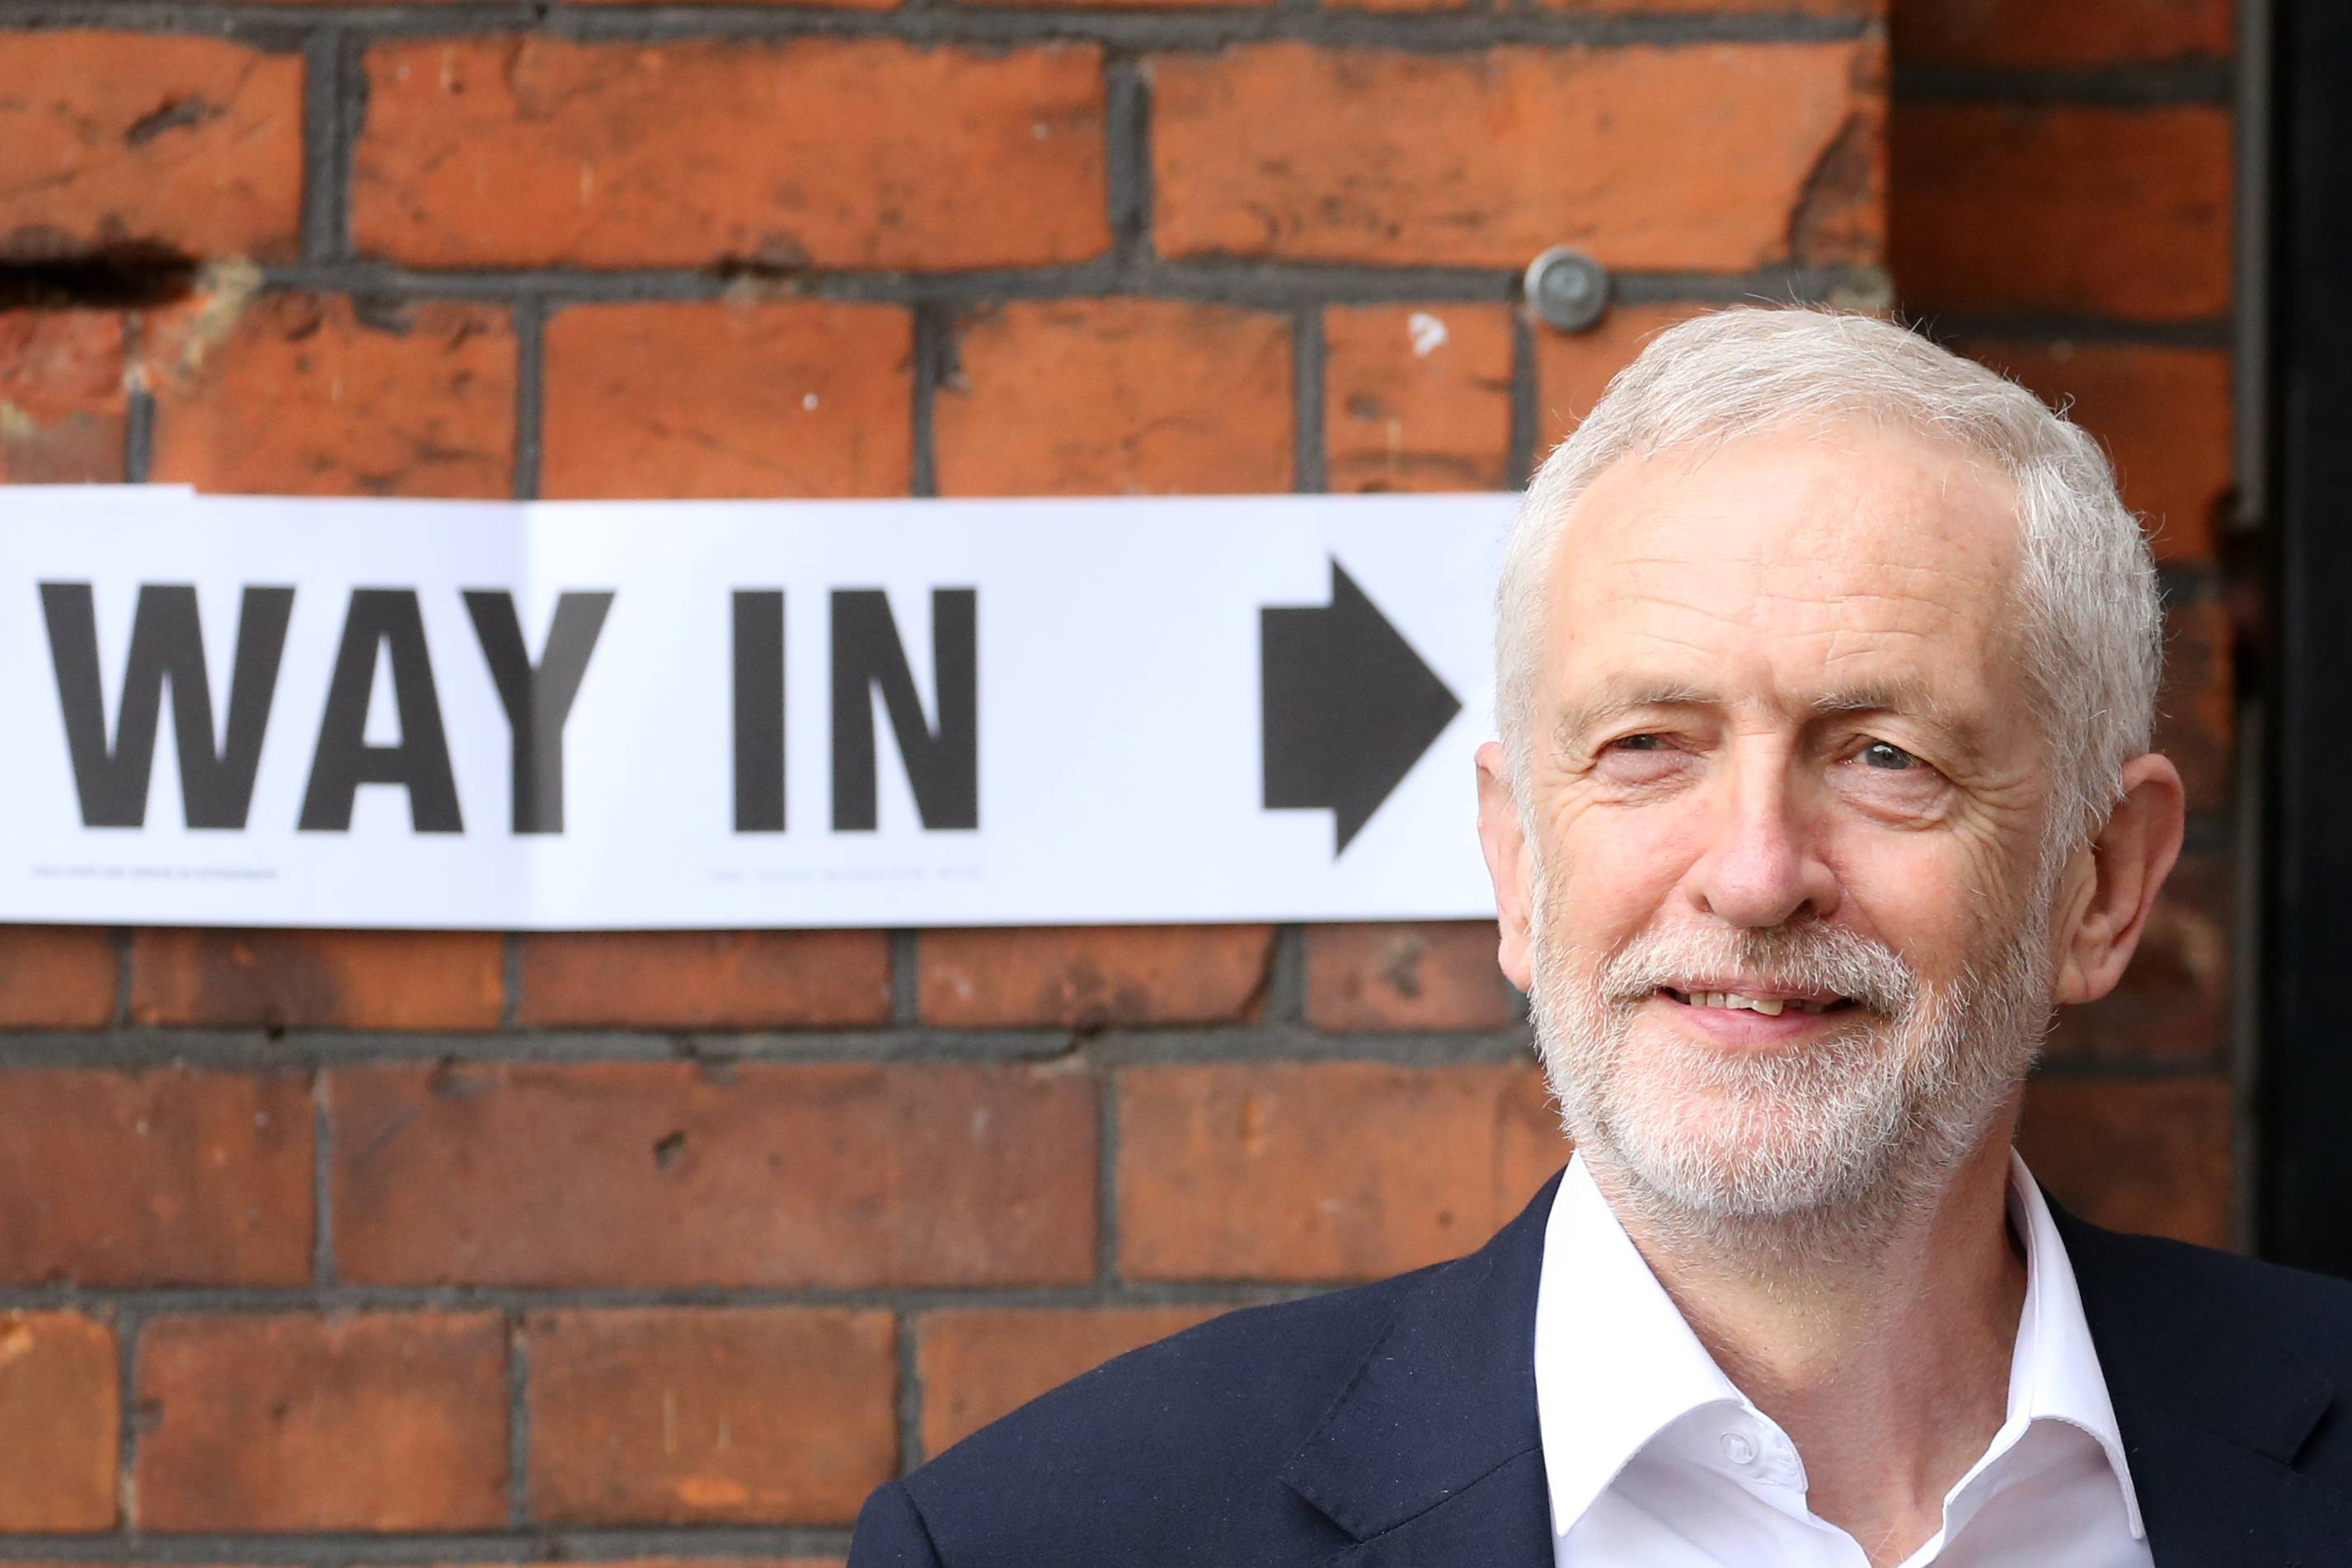 Líder do Partido Trabalhista, da oposição, Jeremy Corbyn   FOTO: Isabel Infantes/AFP